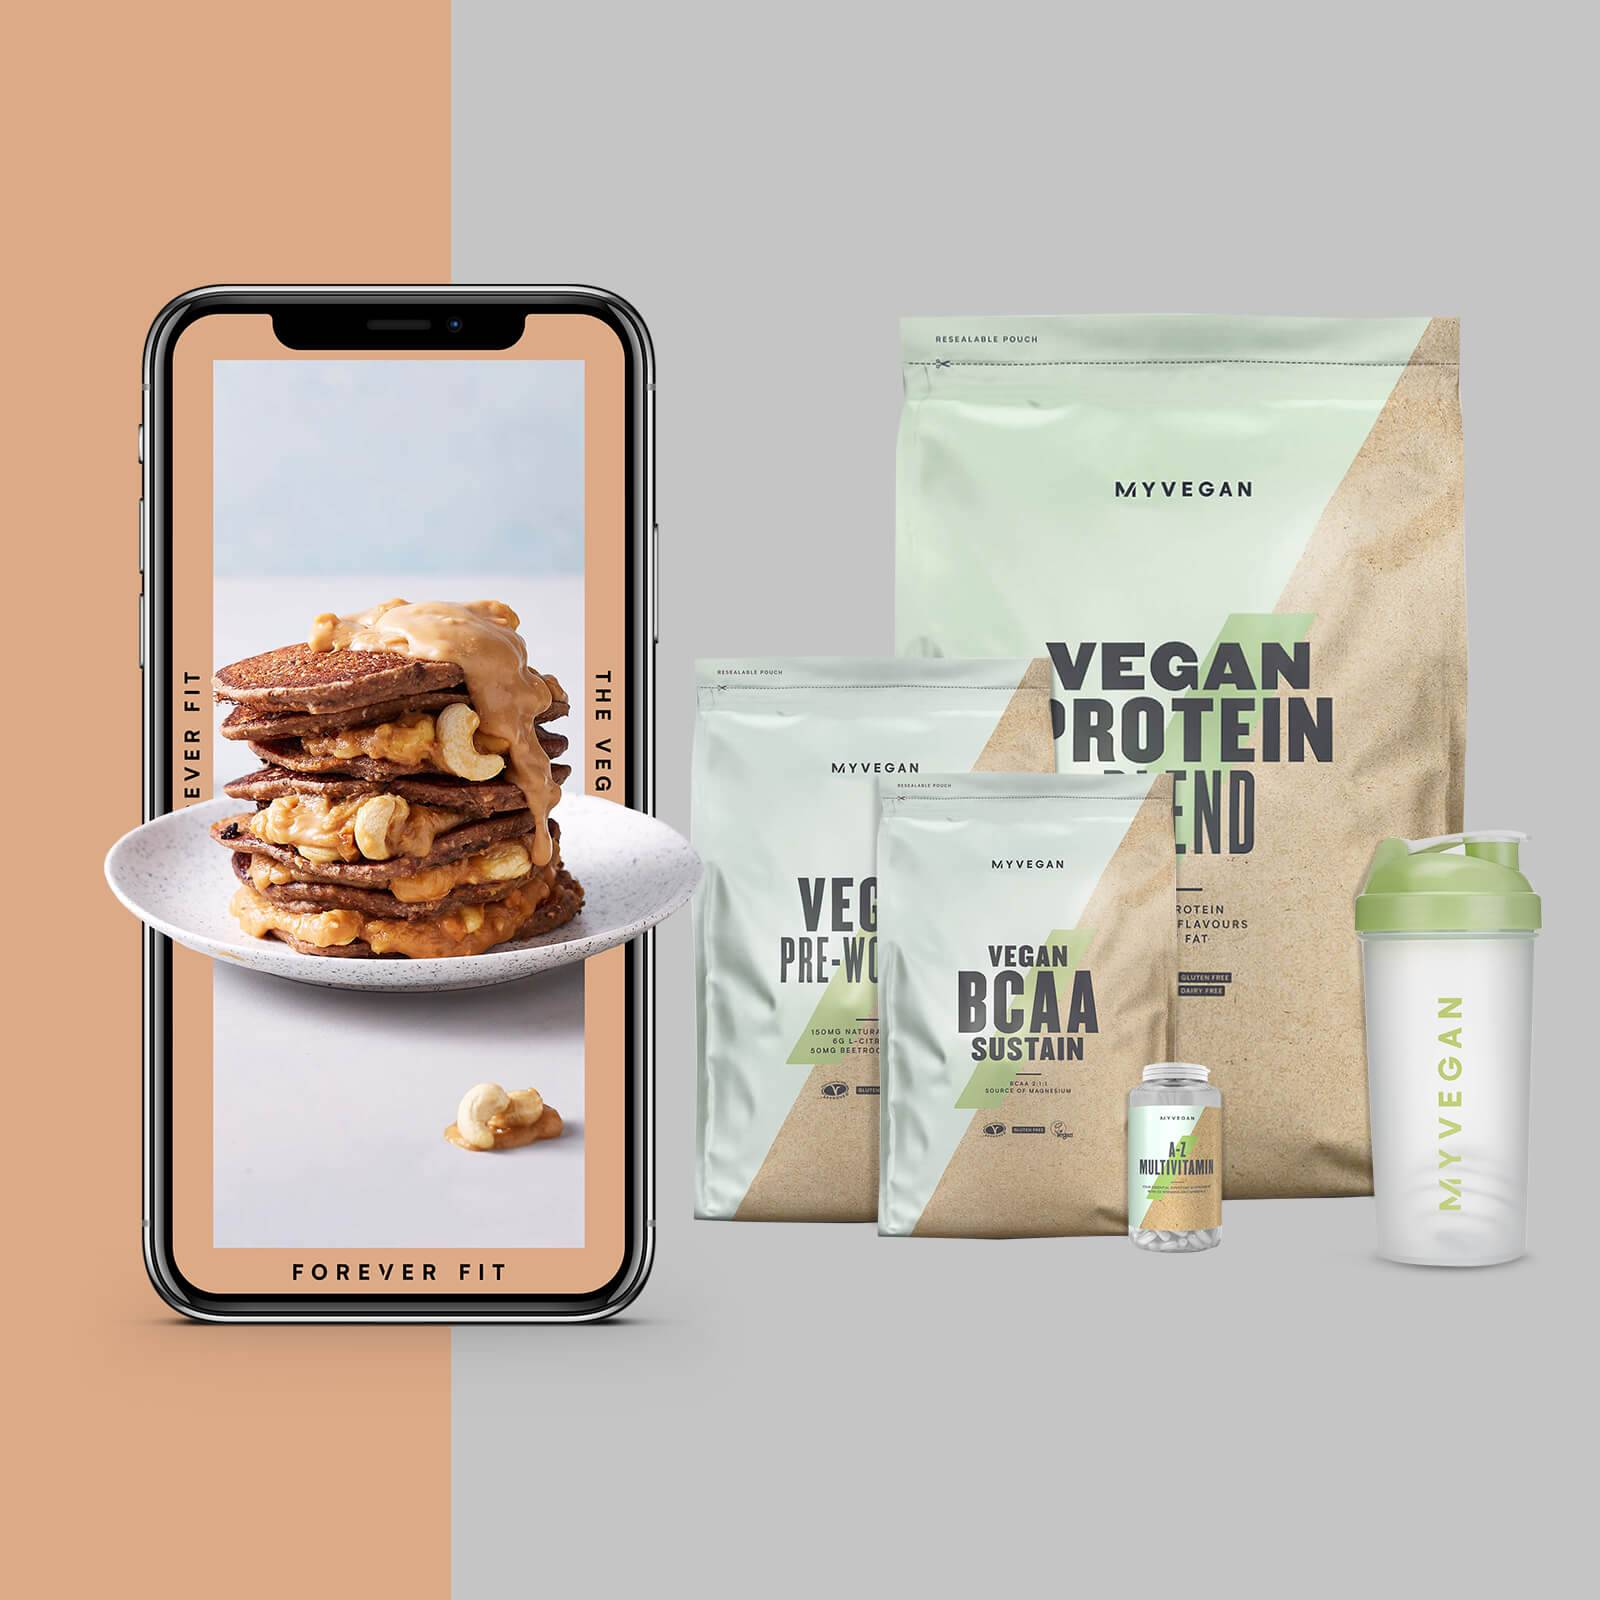 Le Pack Vegan + Guide Entraînement et Nutrition Offert - Orange - Sour Apple - Strawberry